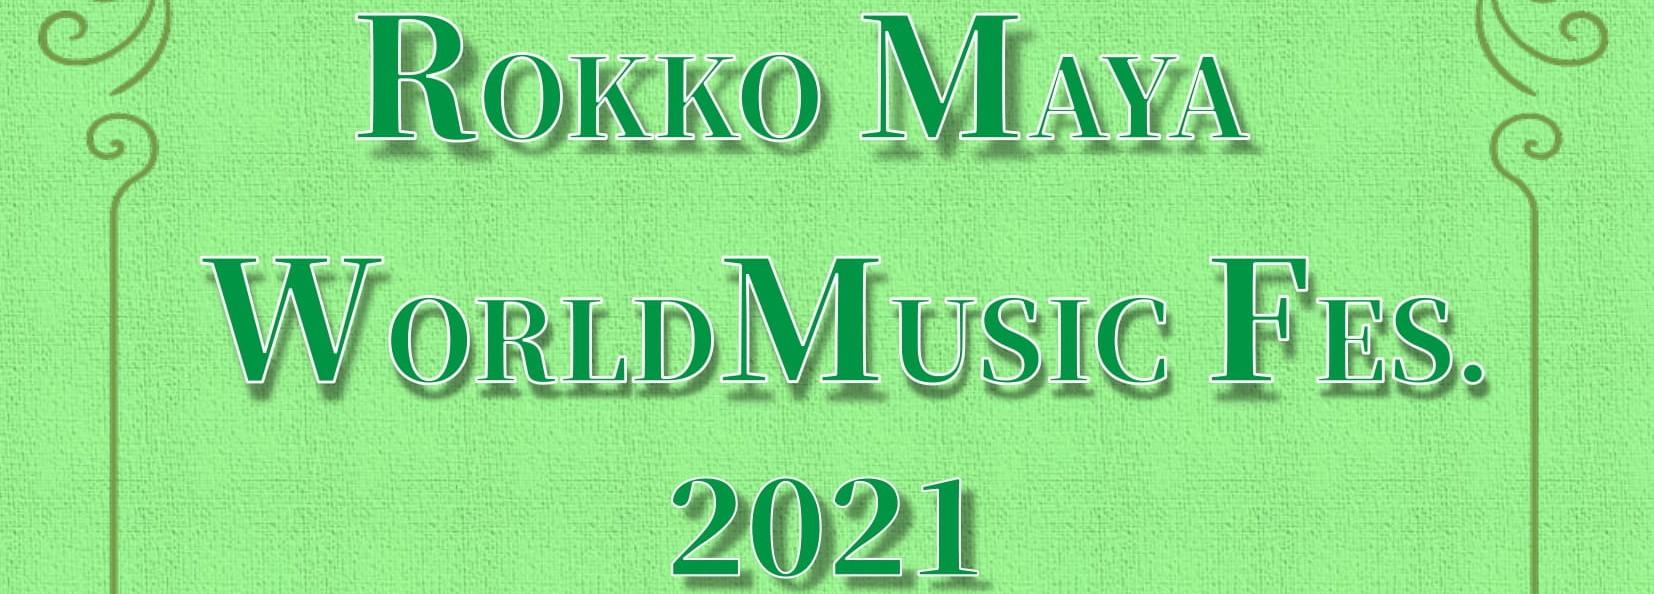 ROKKO MAYA WORLD MUSIC FES. 2021